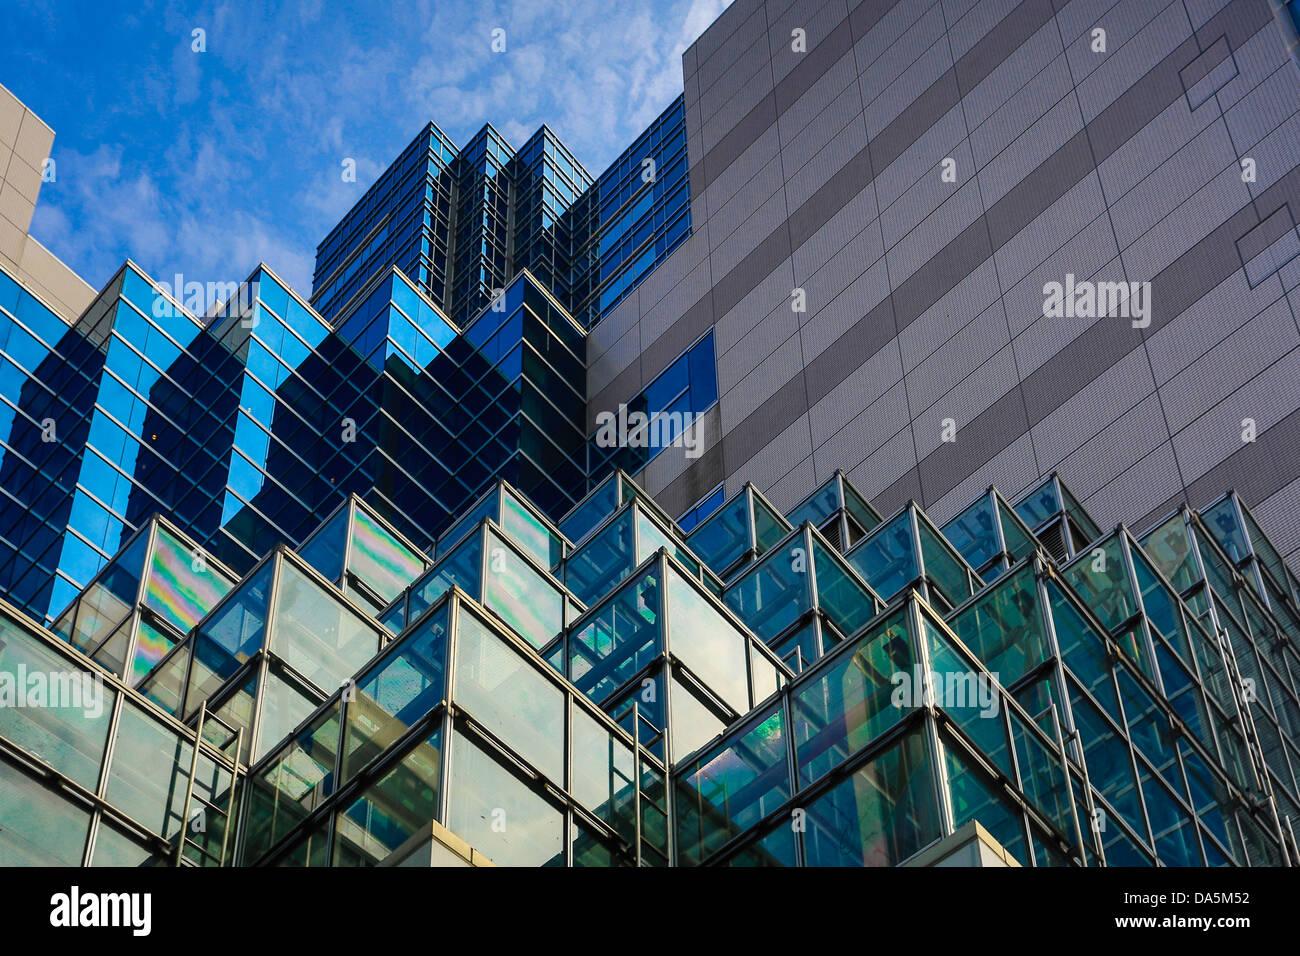 Japan, Asia, Tokyo, City, Ikebukuro, District, detail, architecture, building, glass, ikebukuro, reflection, - Stock Image